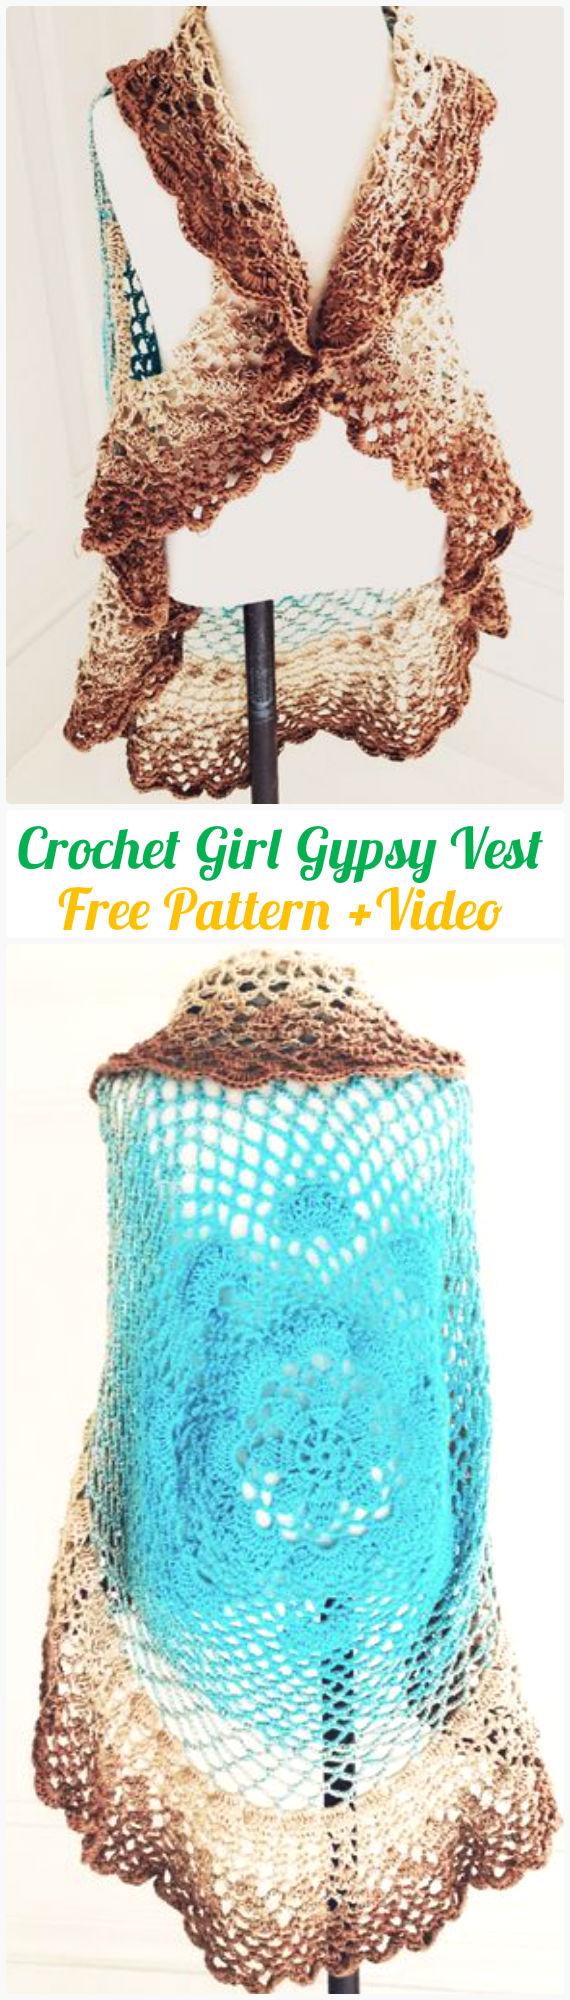 Diy Crochet Circular Vest Sweater Jacket Free Patterns